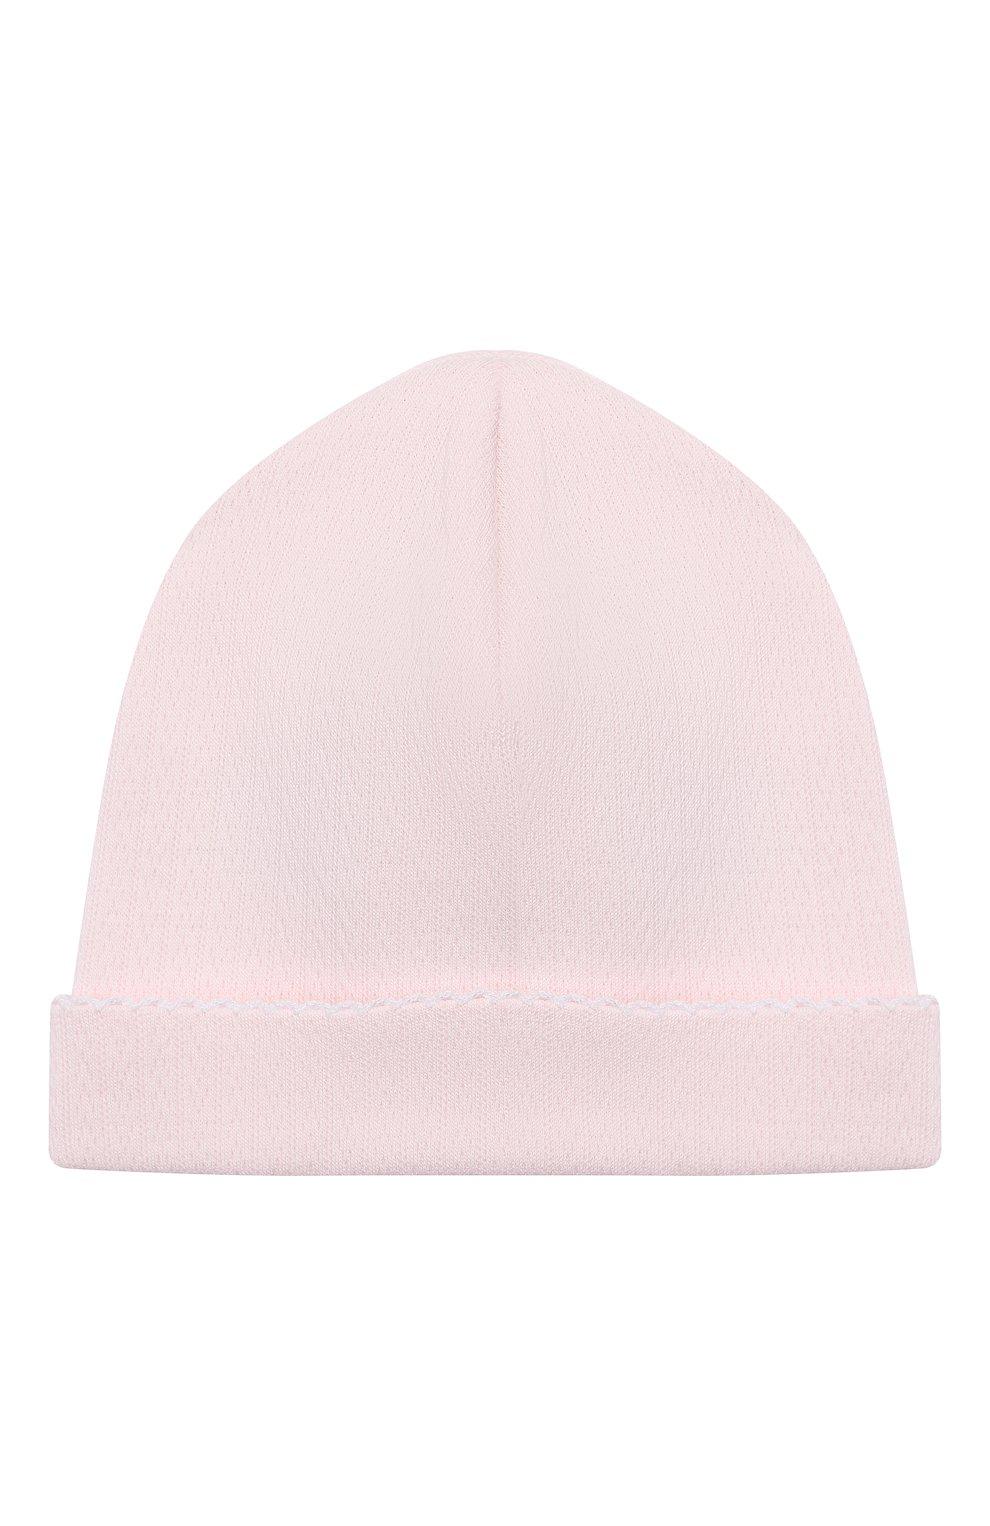 Детский комплект из распашонки с шапкой и ползунков KISSY KISSY розового цвета, арт. 141207 | Фото 6